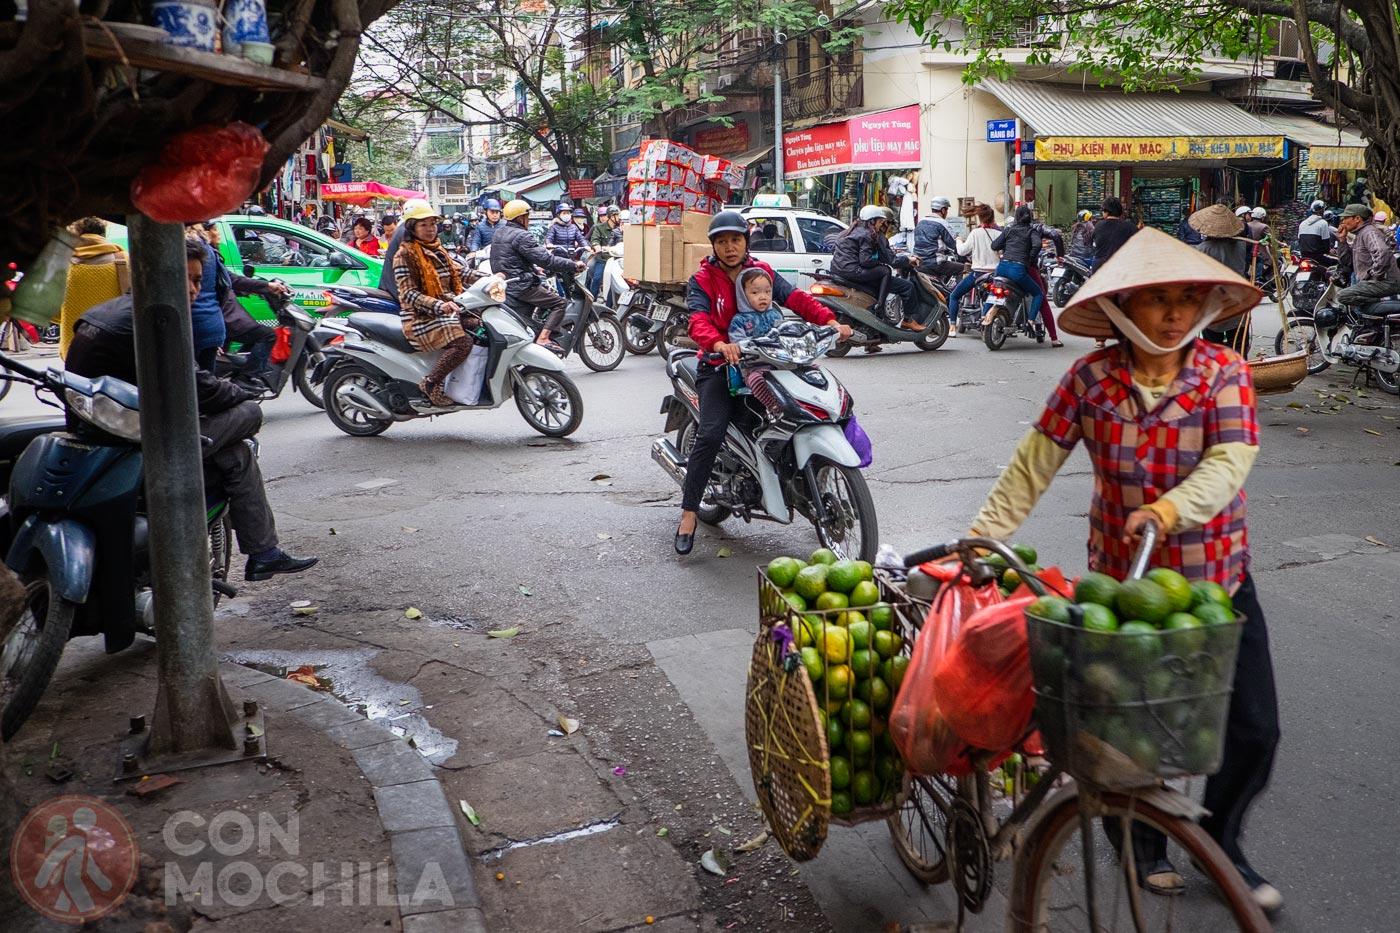 Old quarter de Hanoi